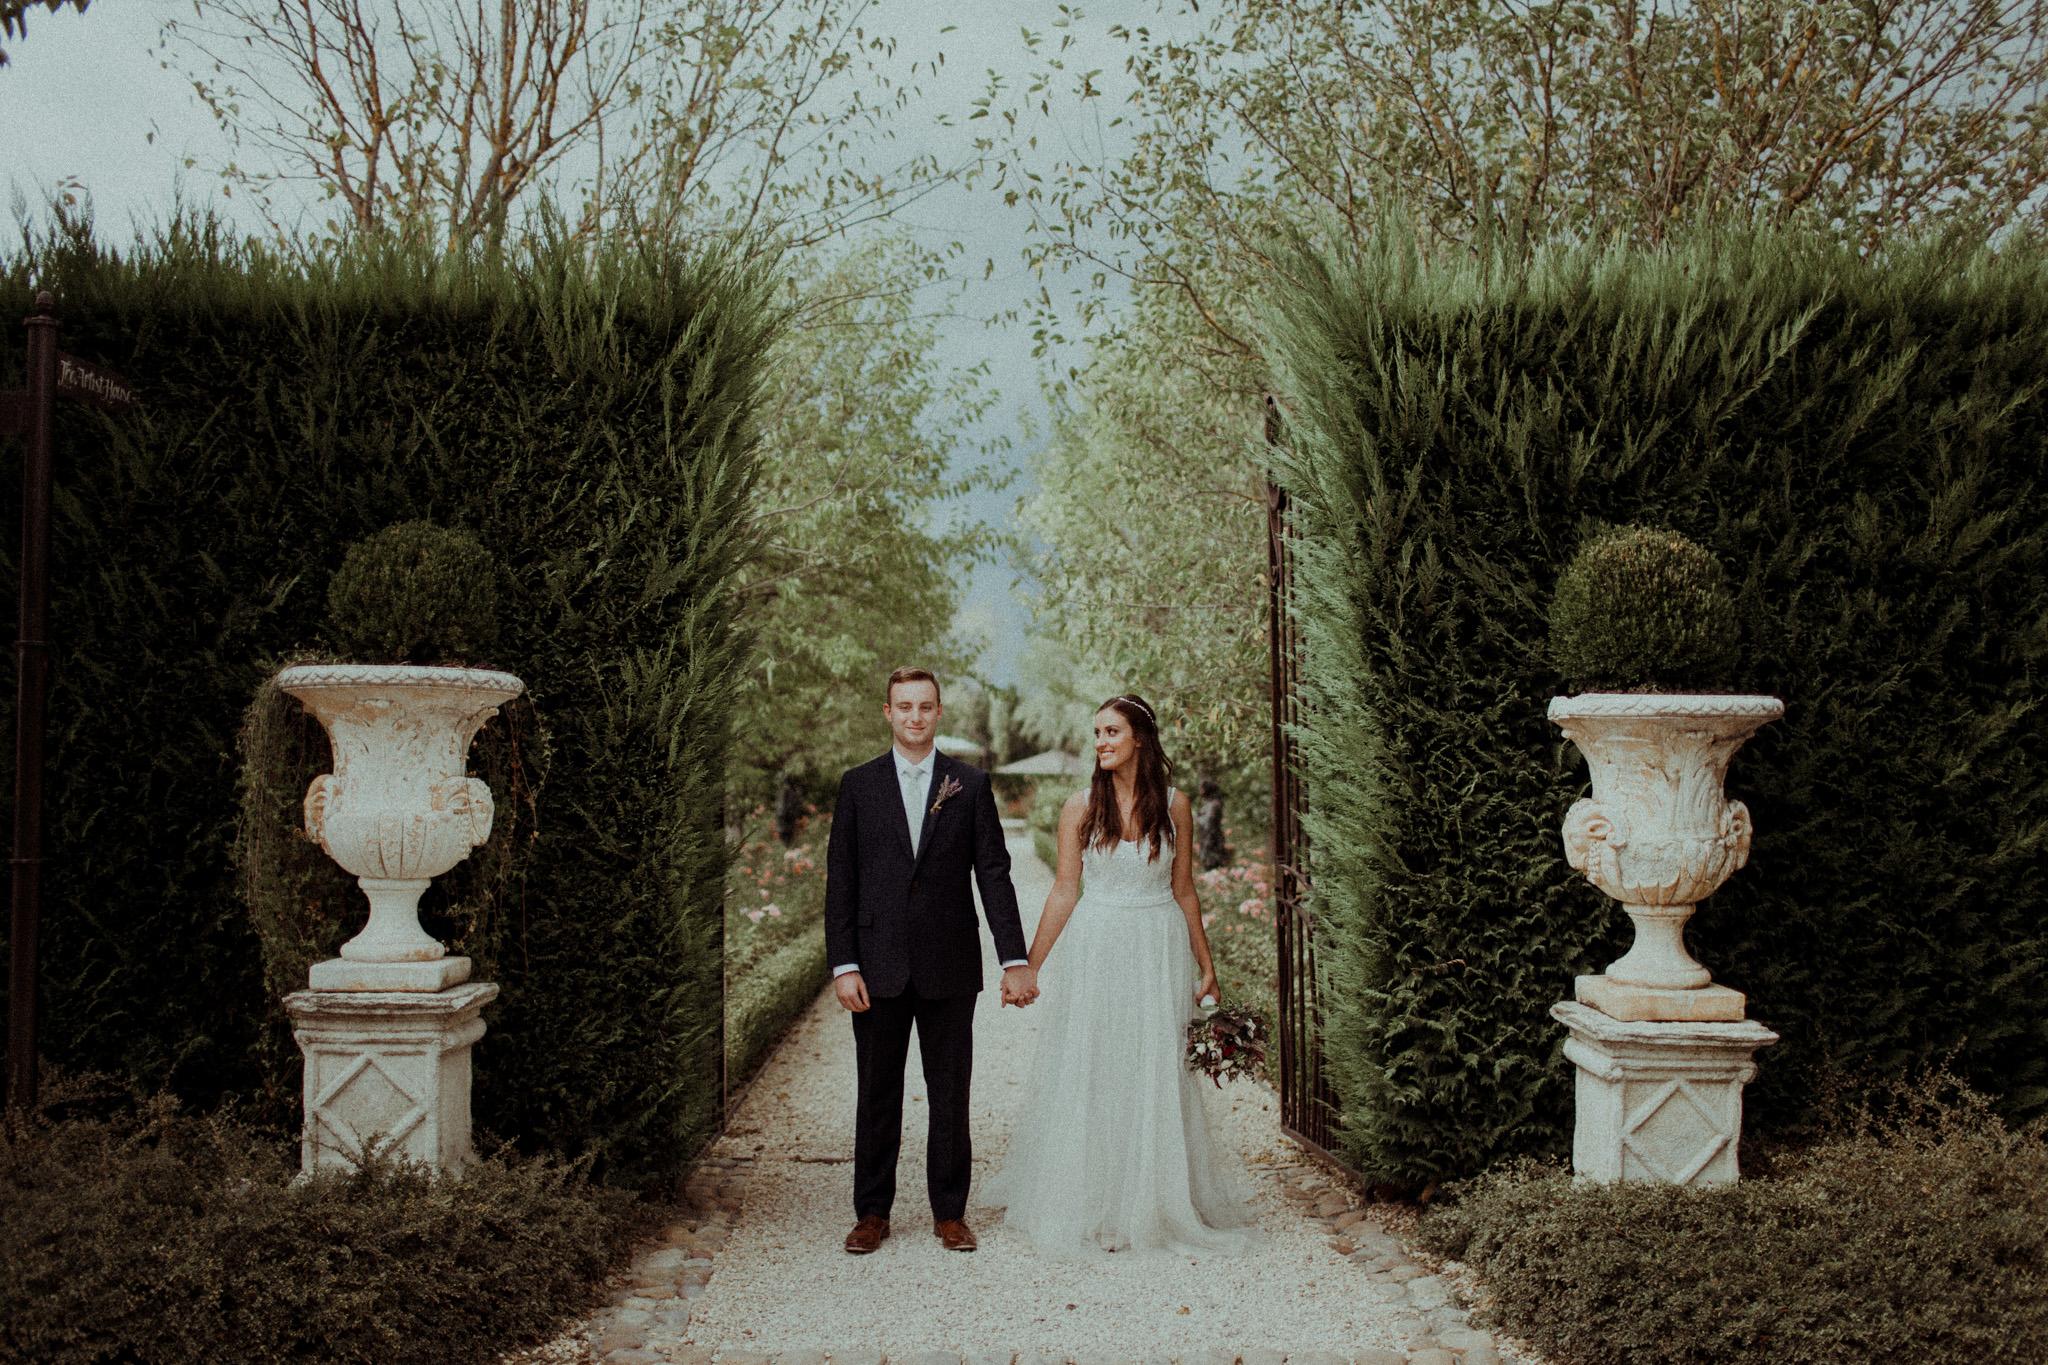 BOHO-ITALIAN-WEDDING-IN-TUSCANY-42.jpg